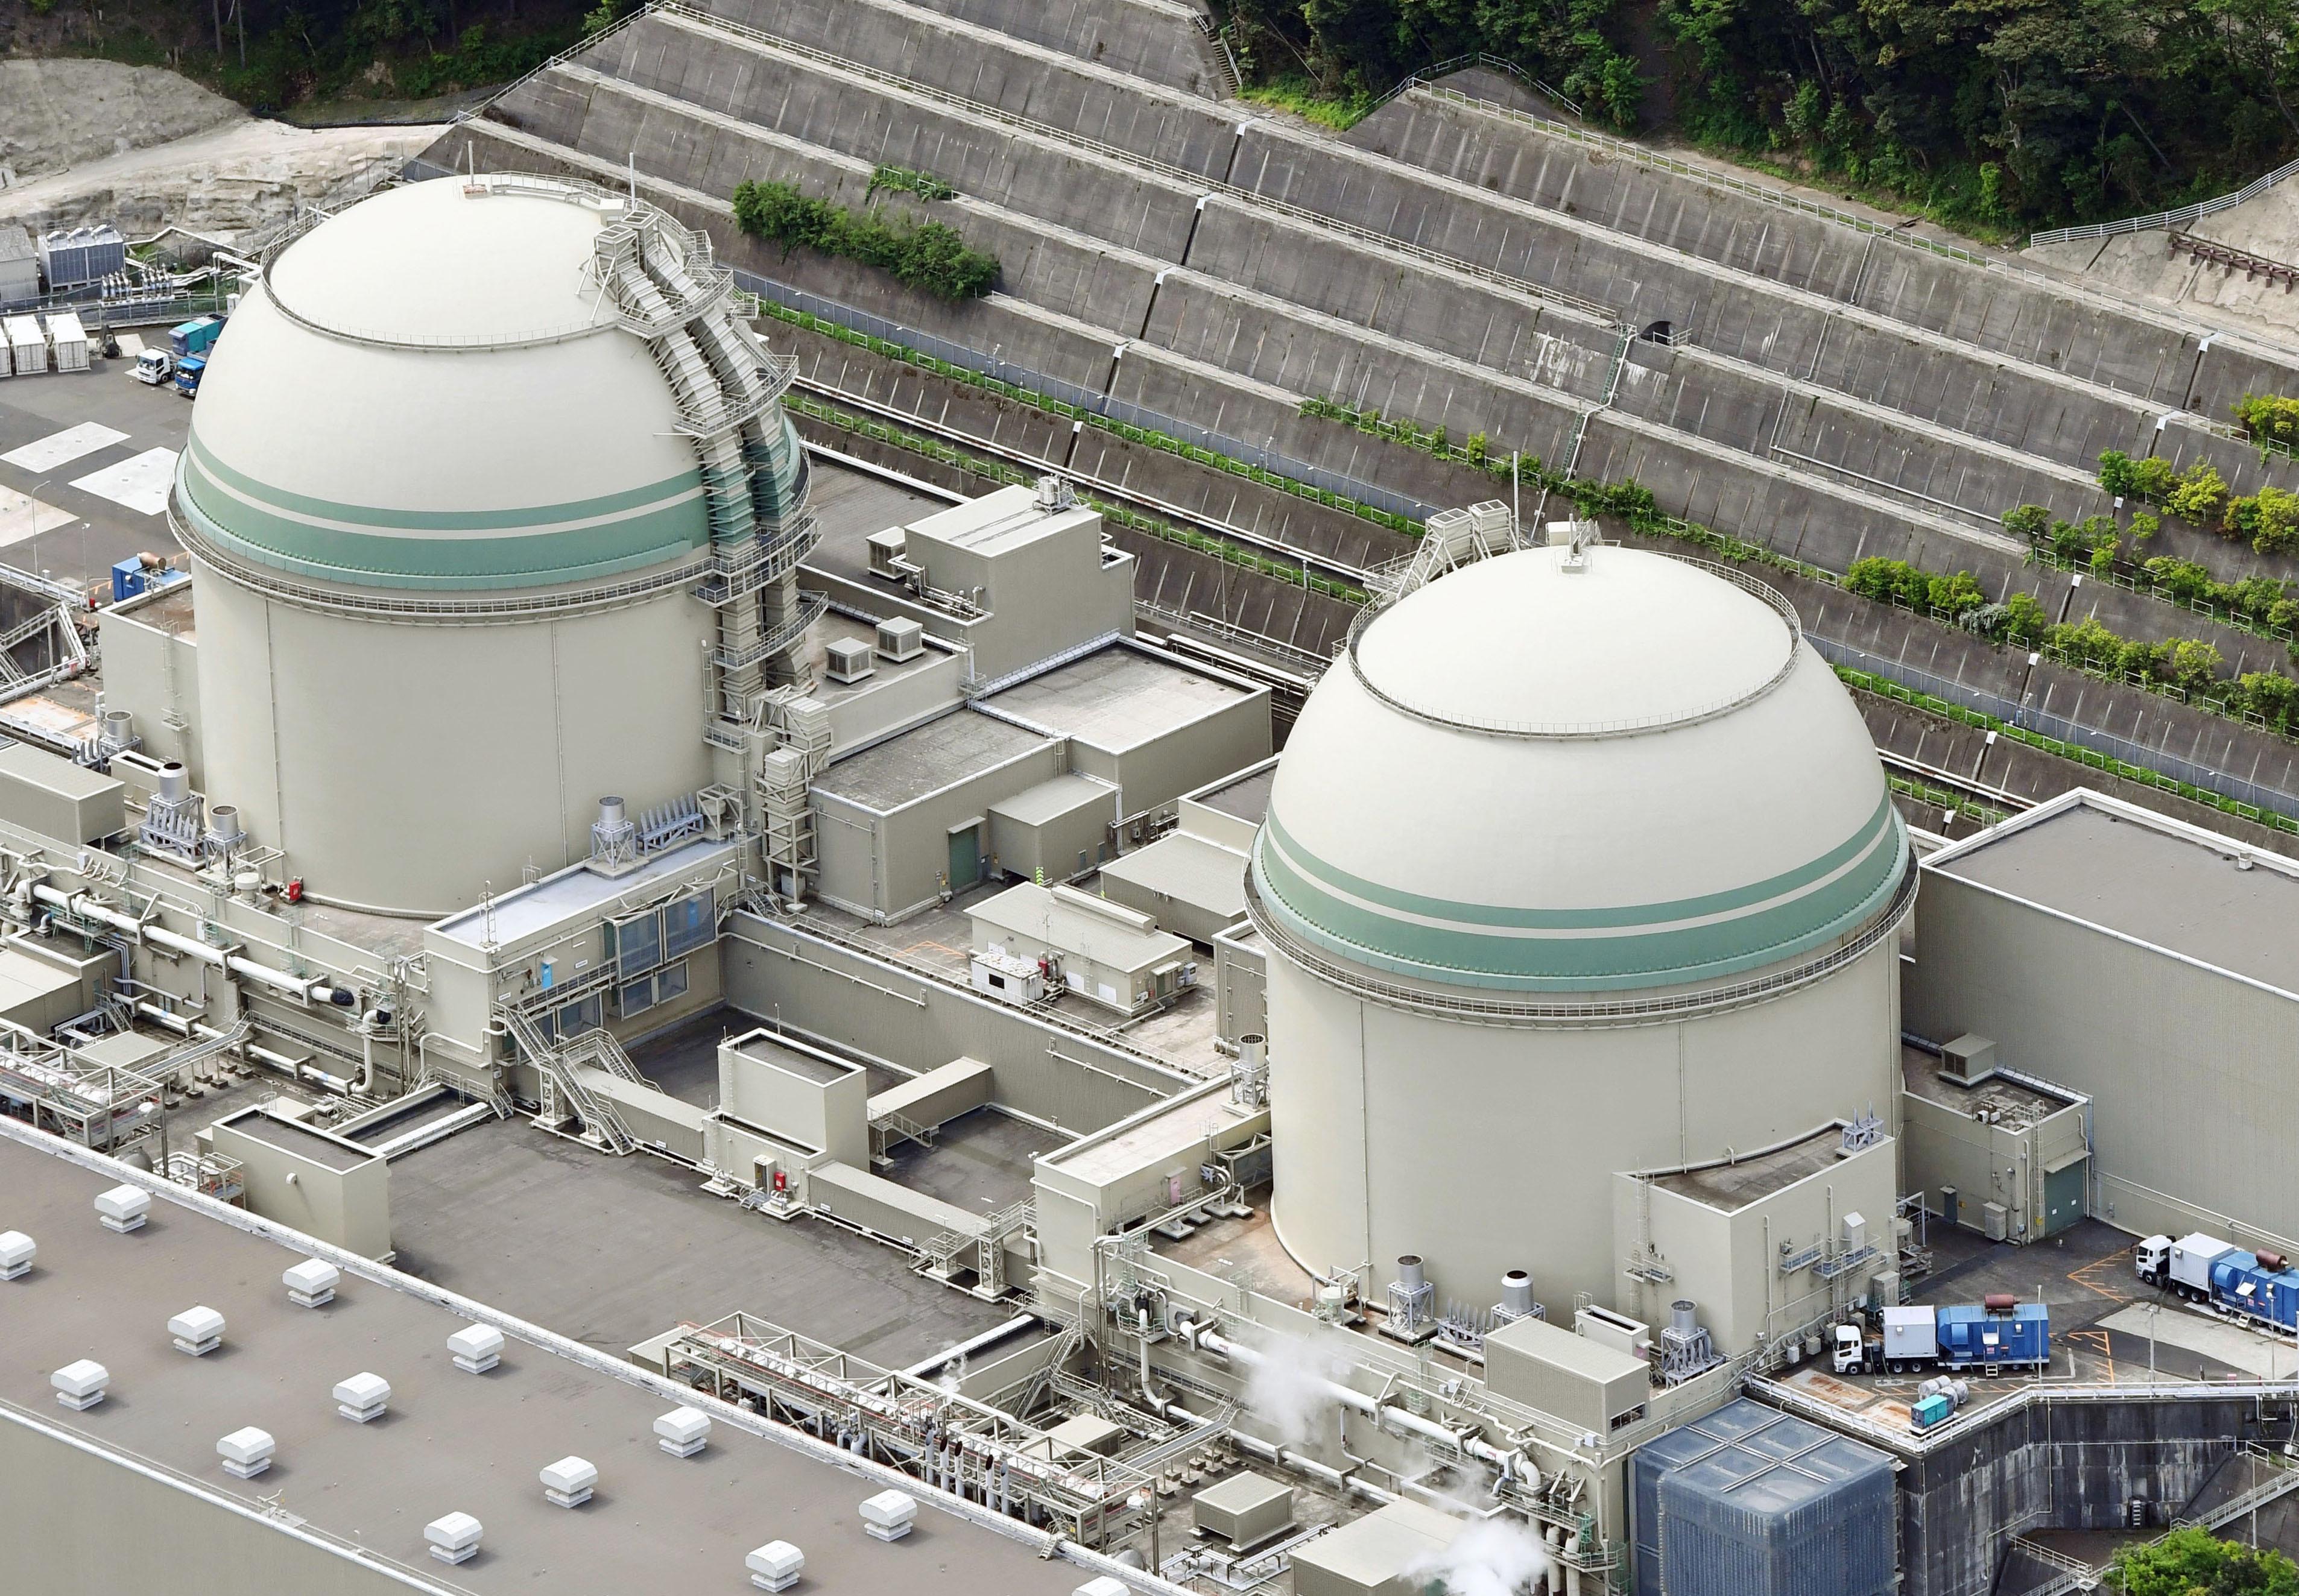 Takahama No. 3 reactor to be reactivated